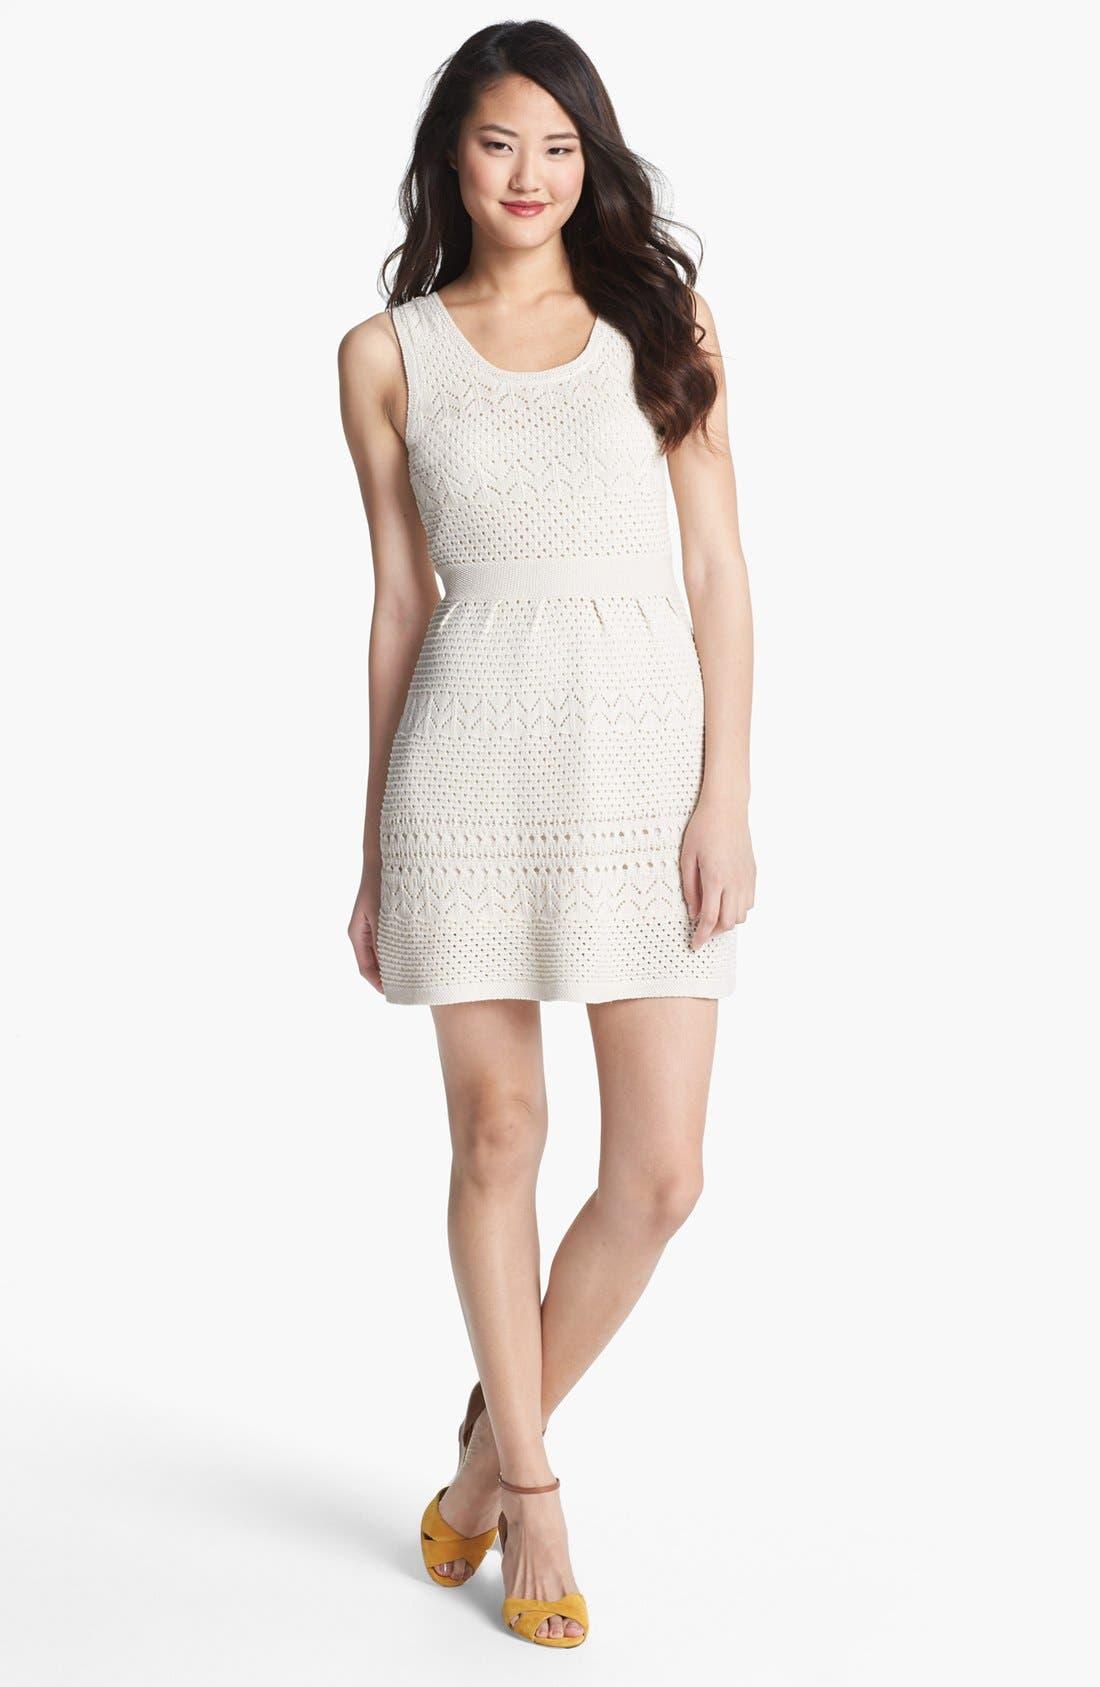 Alternate Image 1 Selected - Jessica Simpson 'Belchic' Open Knit Dress